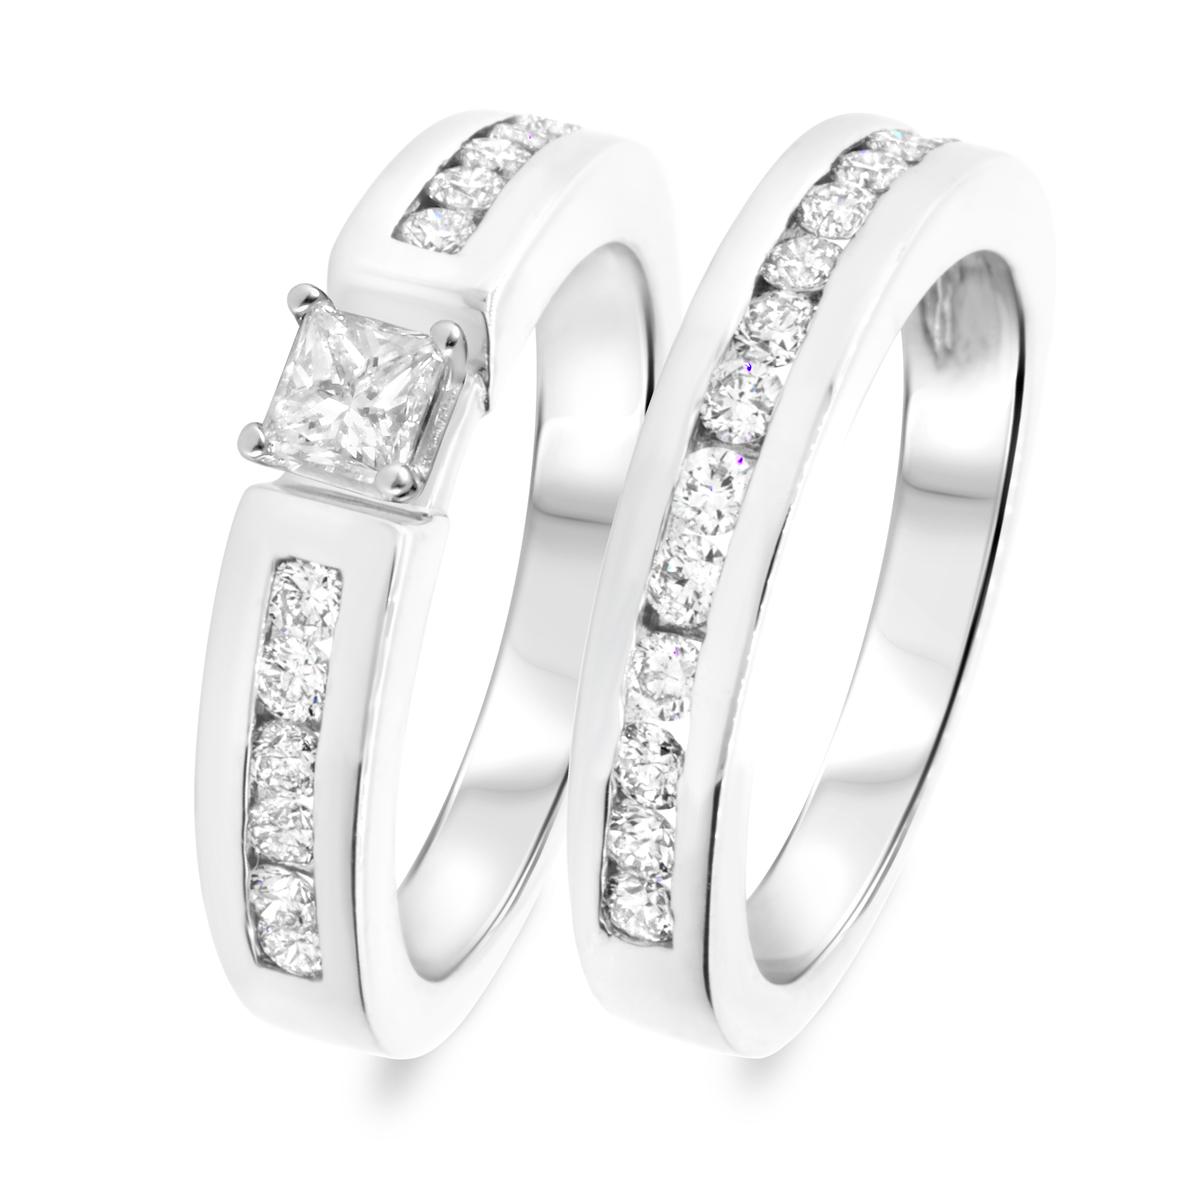 1 1/4 CT. T.W. Diamond Women's Bridal Wedding Ring Set 10K White Gold